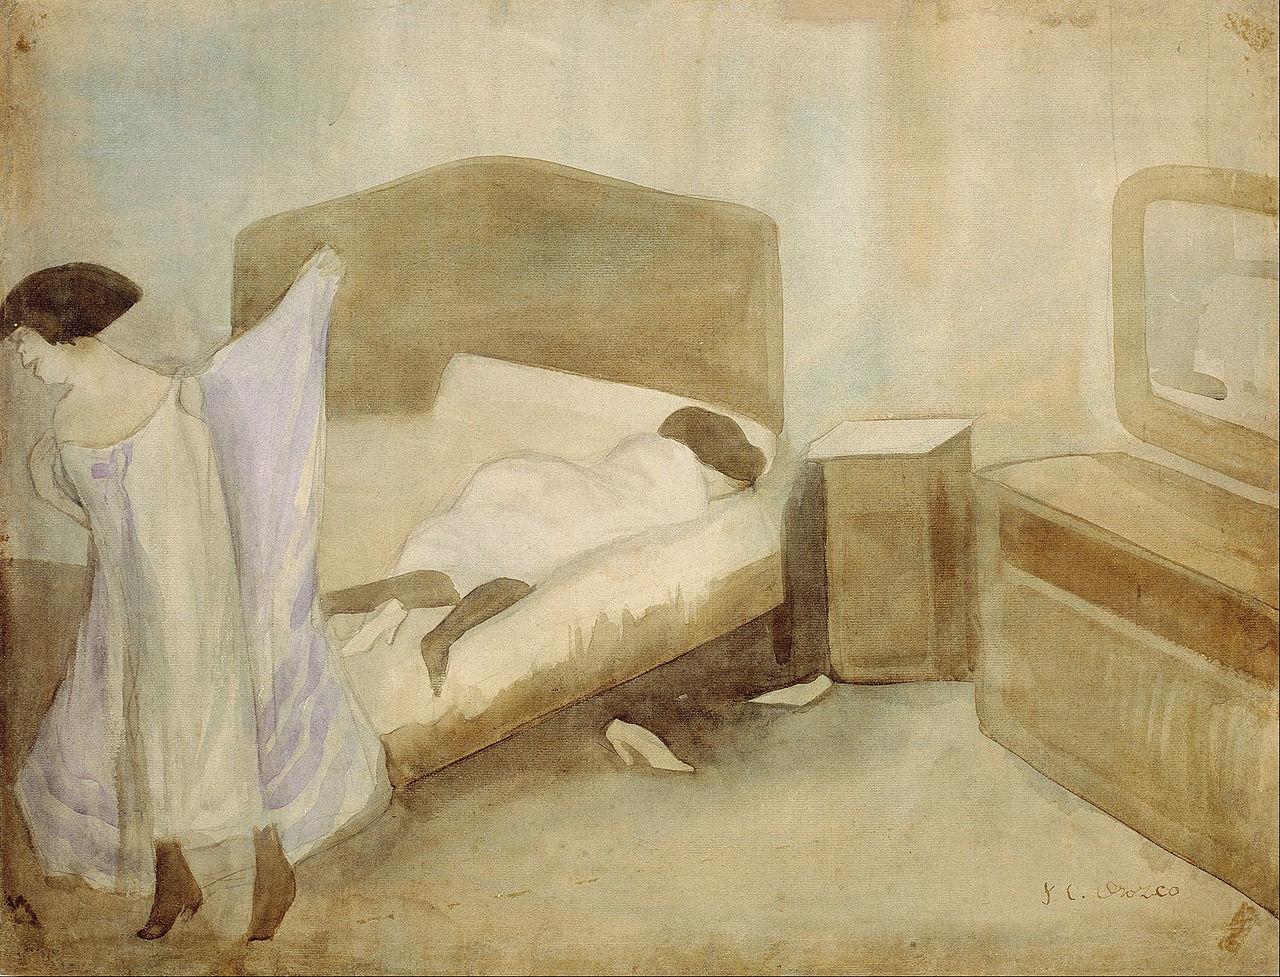 File:José Clemente Orozco - The Bedroom - Google Art Project.jpg ...